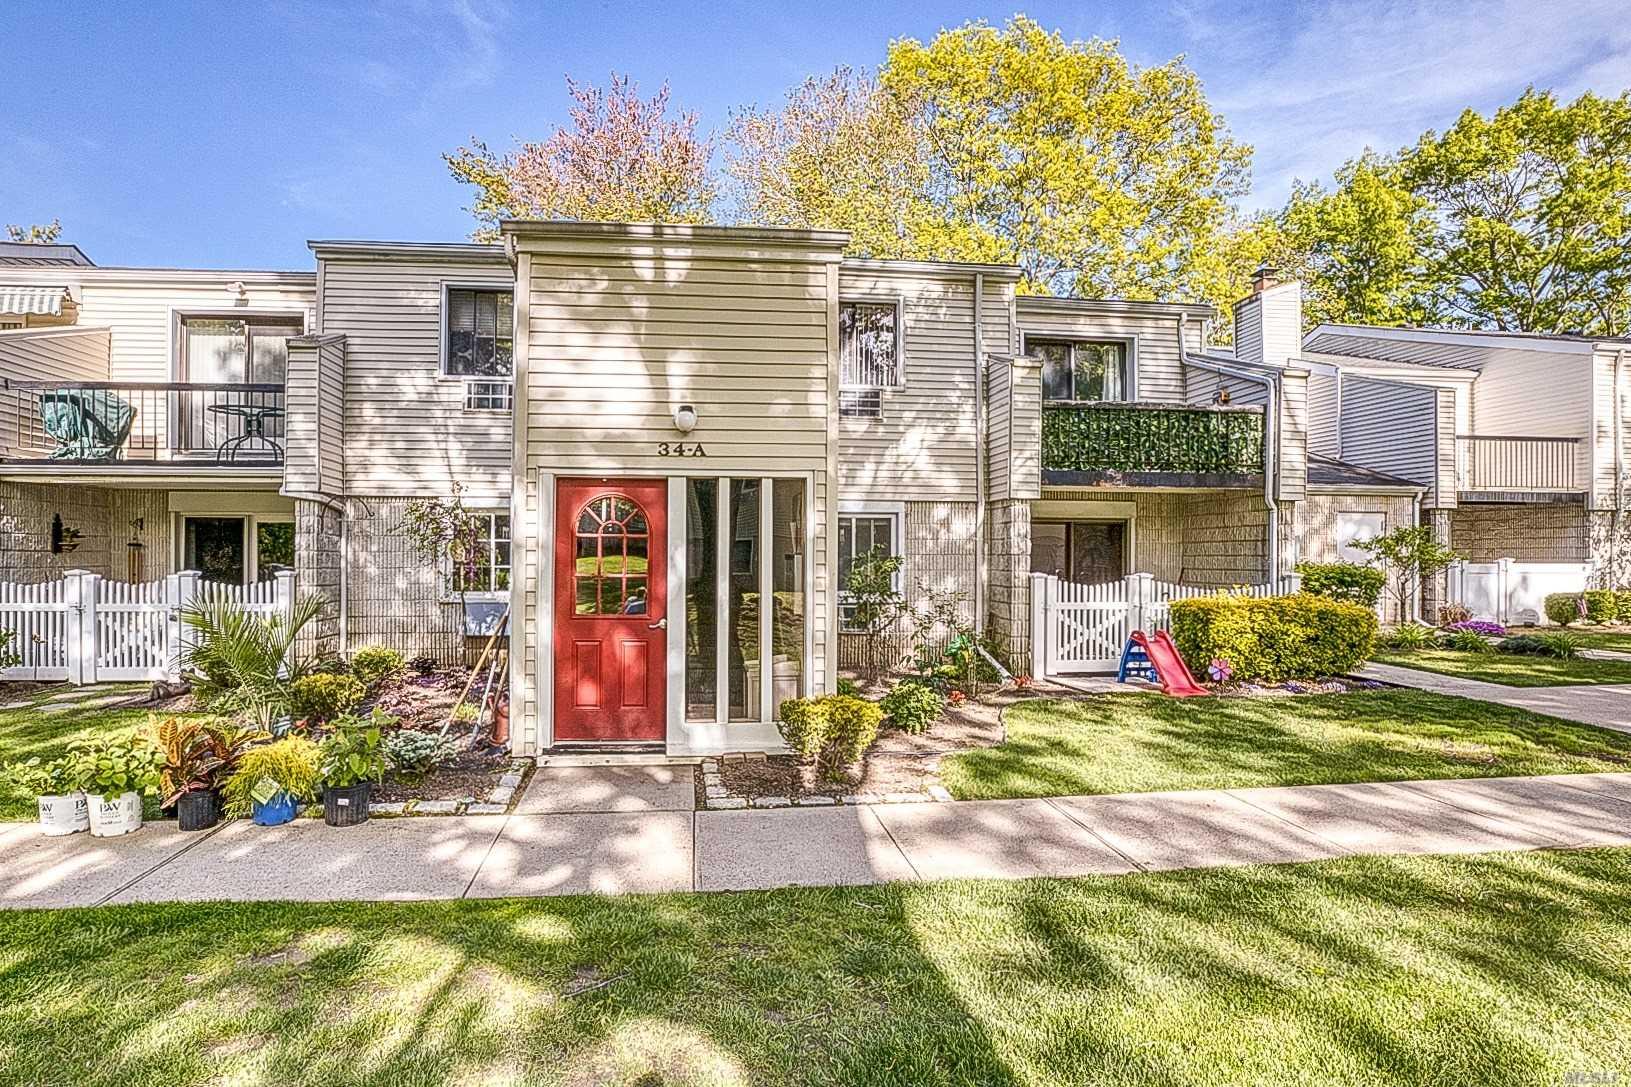 Property for sale at 34 Richmond Boulevard # 2A, Ronkonkoma NY 11779, Ronkonkoma,  New York 11779